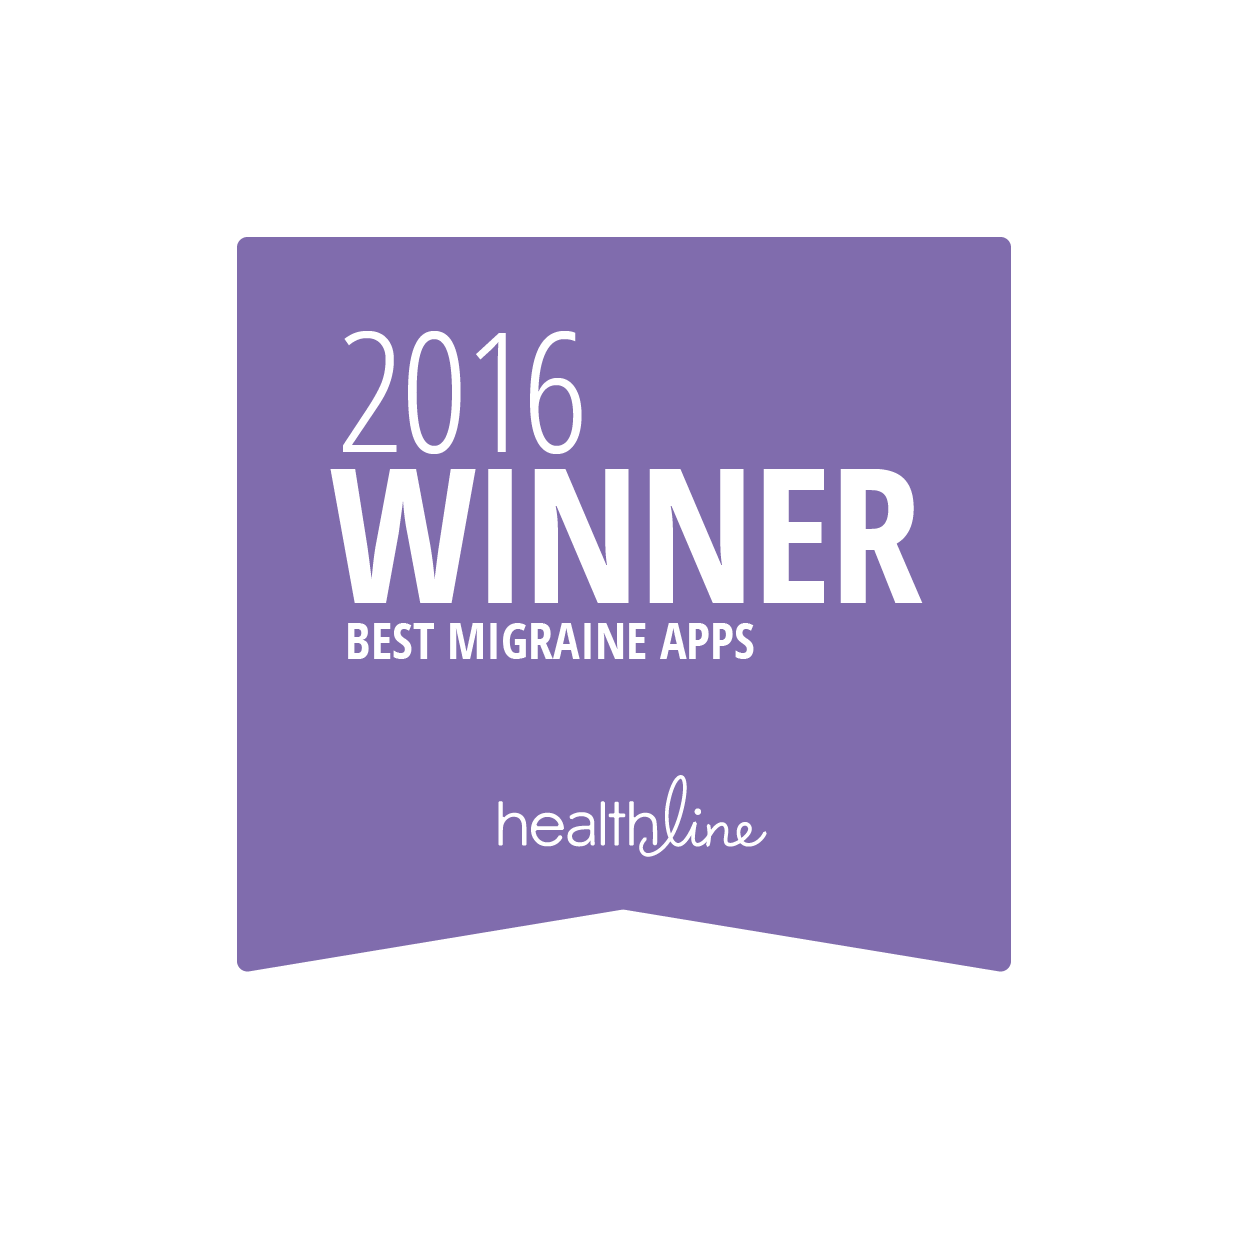 The Best Migraine Apps of 2016